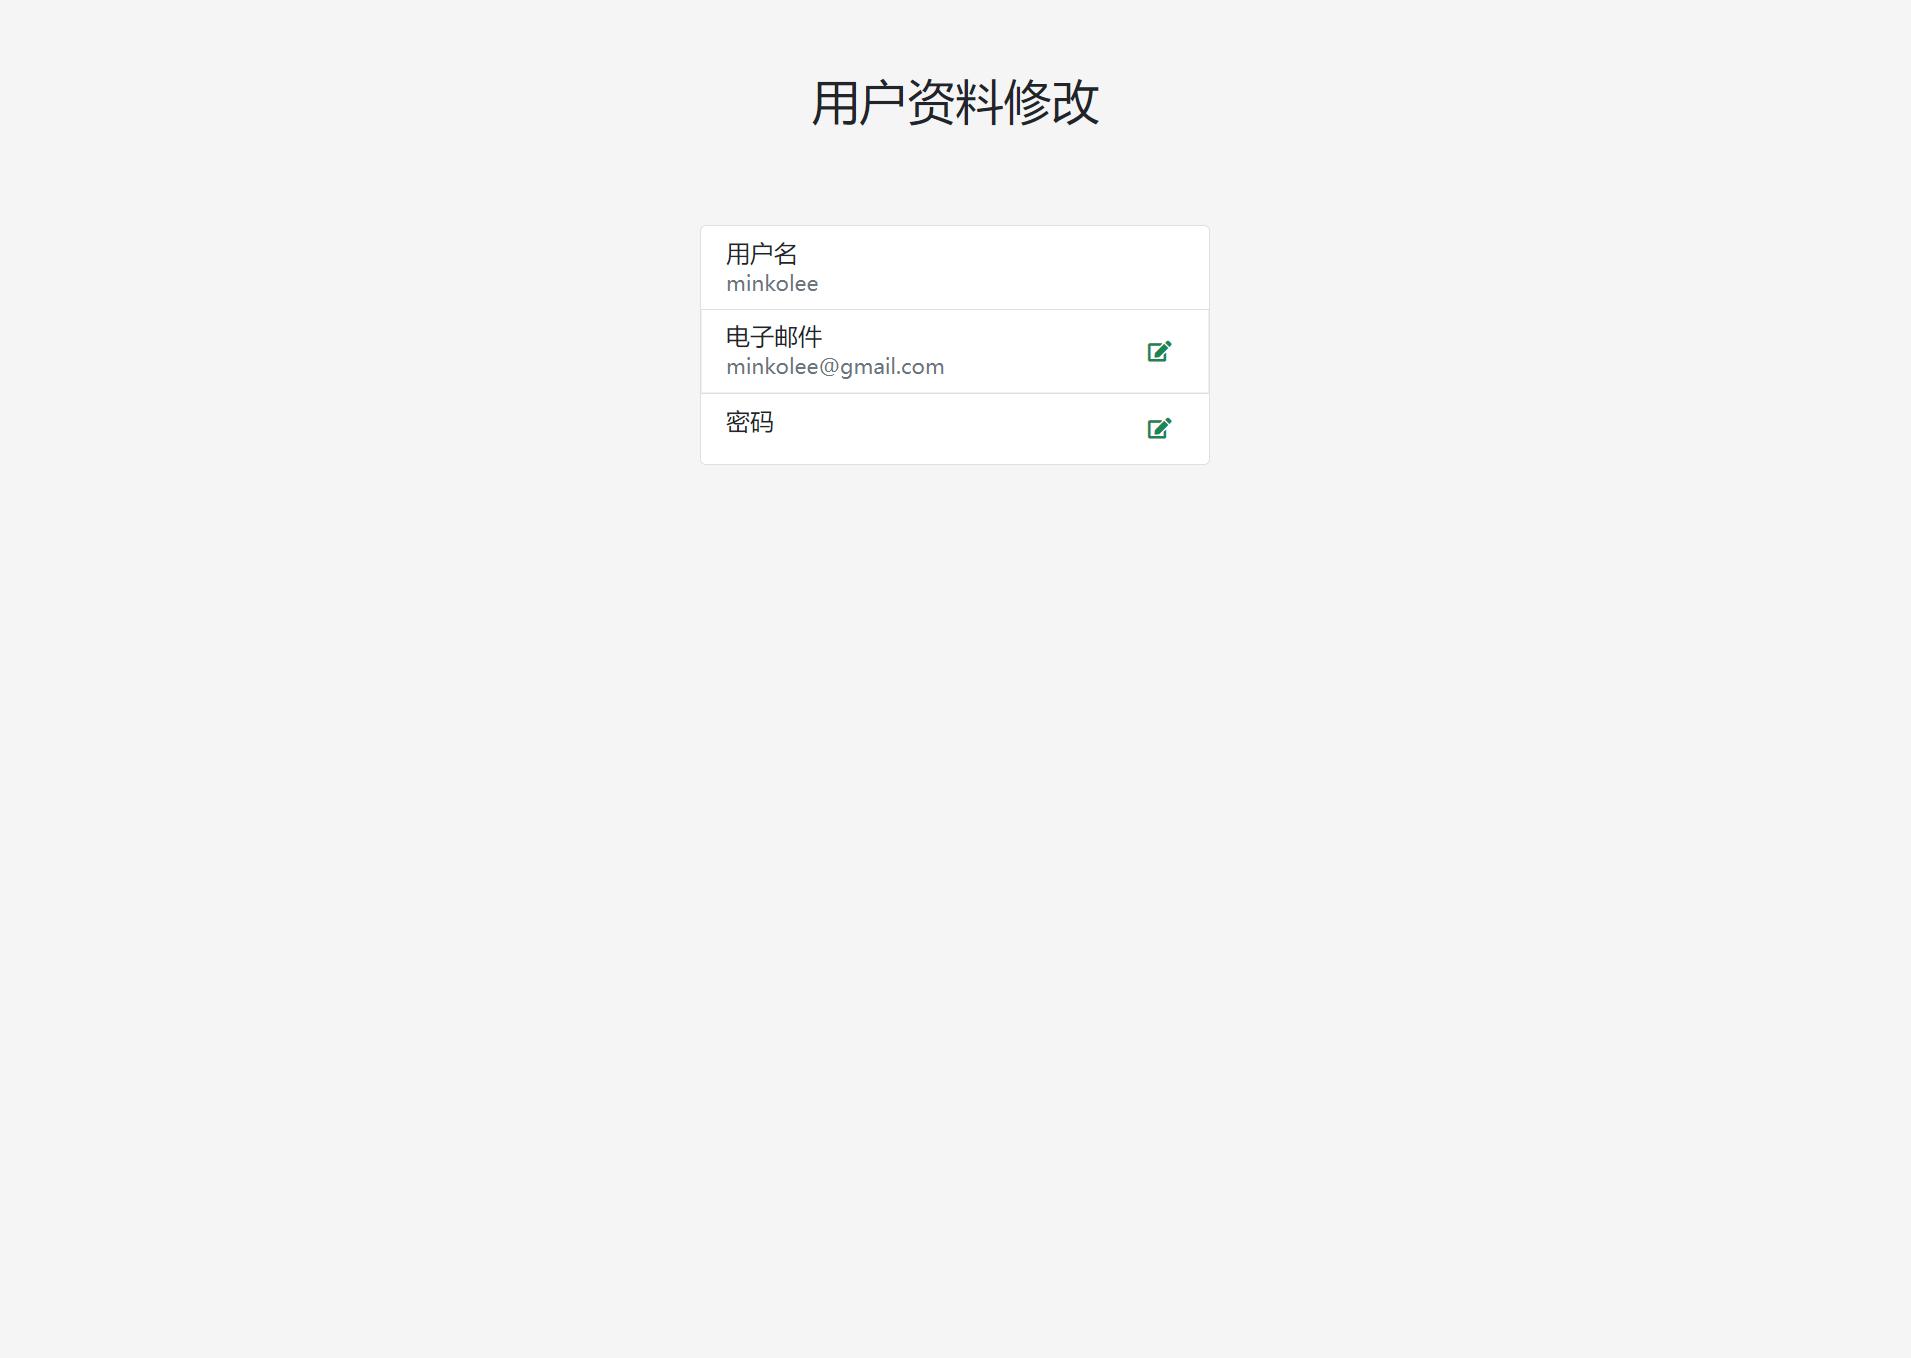 fms-profile1